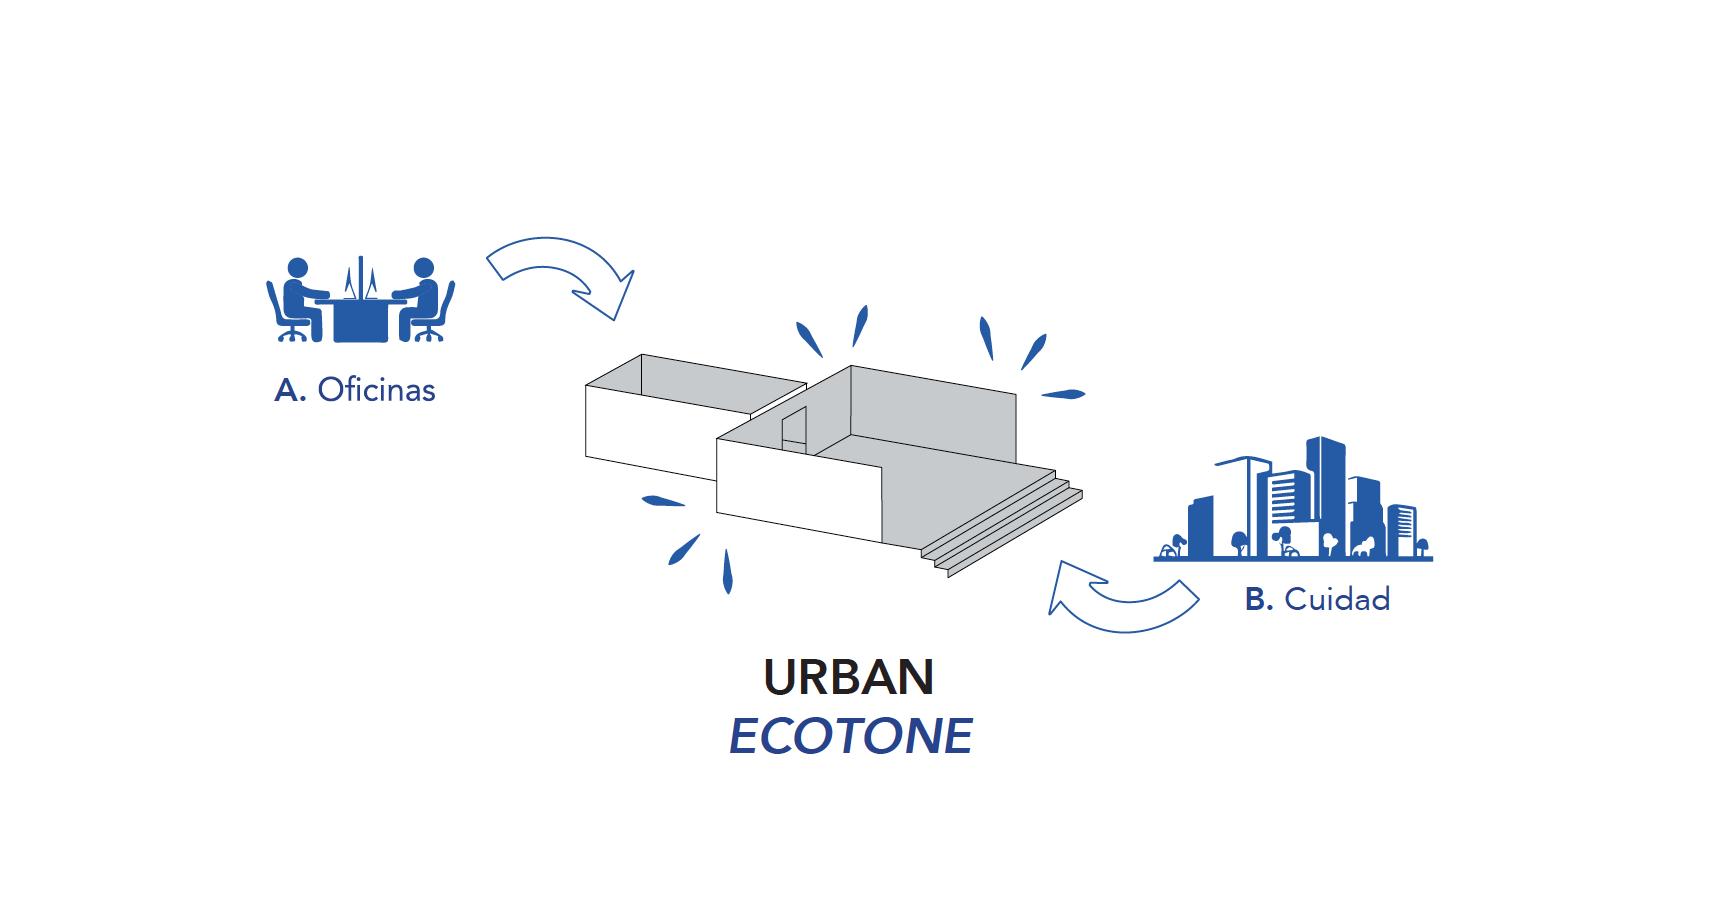 Urban Ecotone